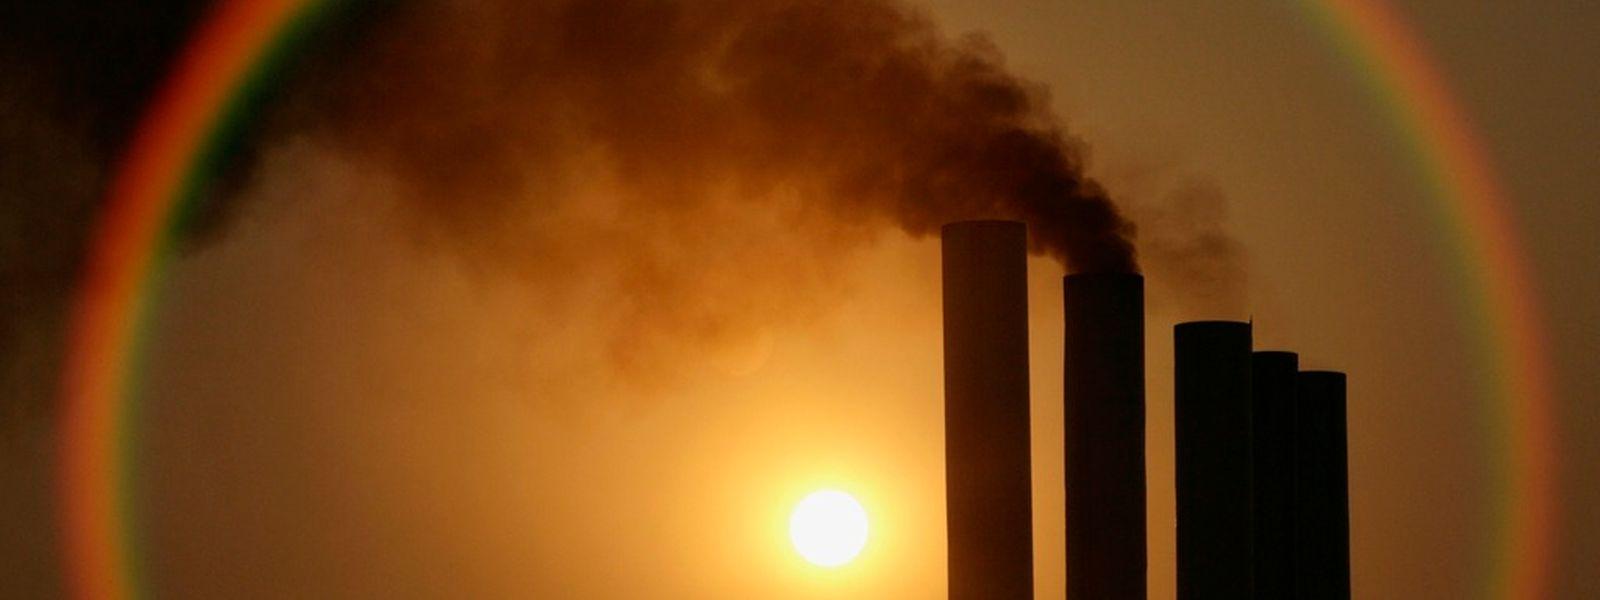 China setzt weiter auf Kohlekraft.